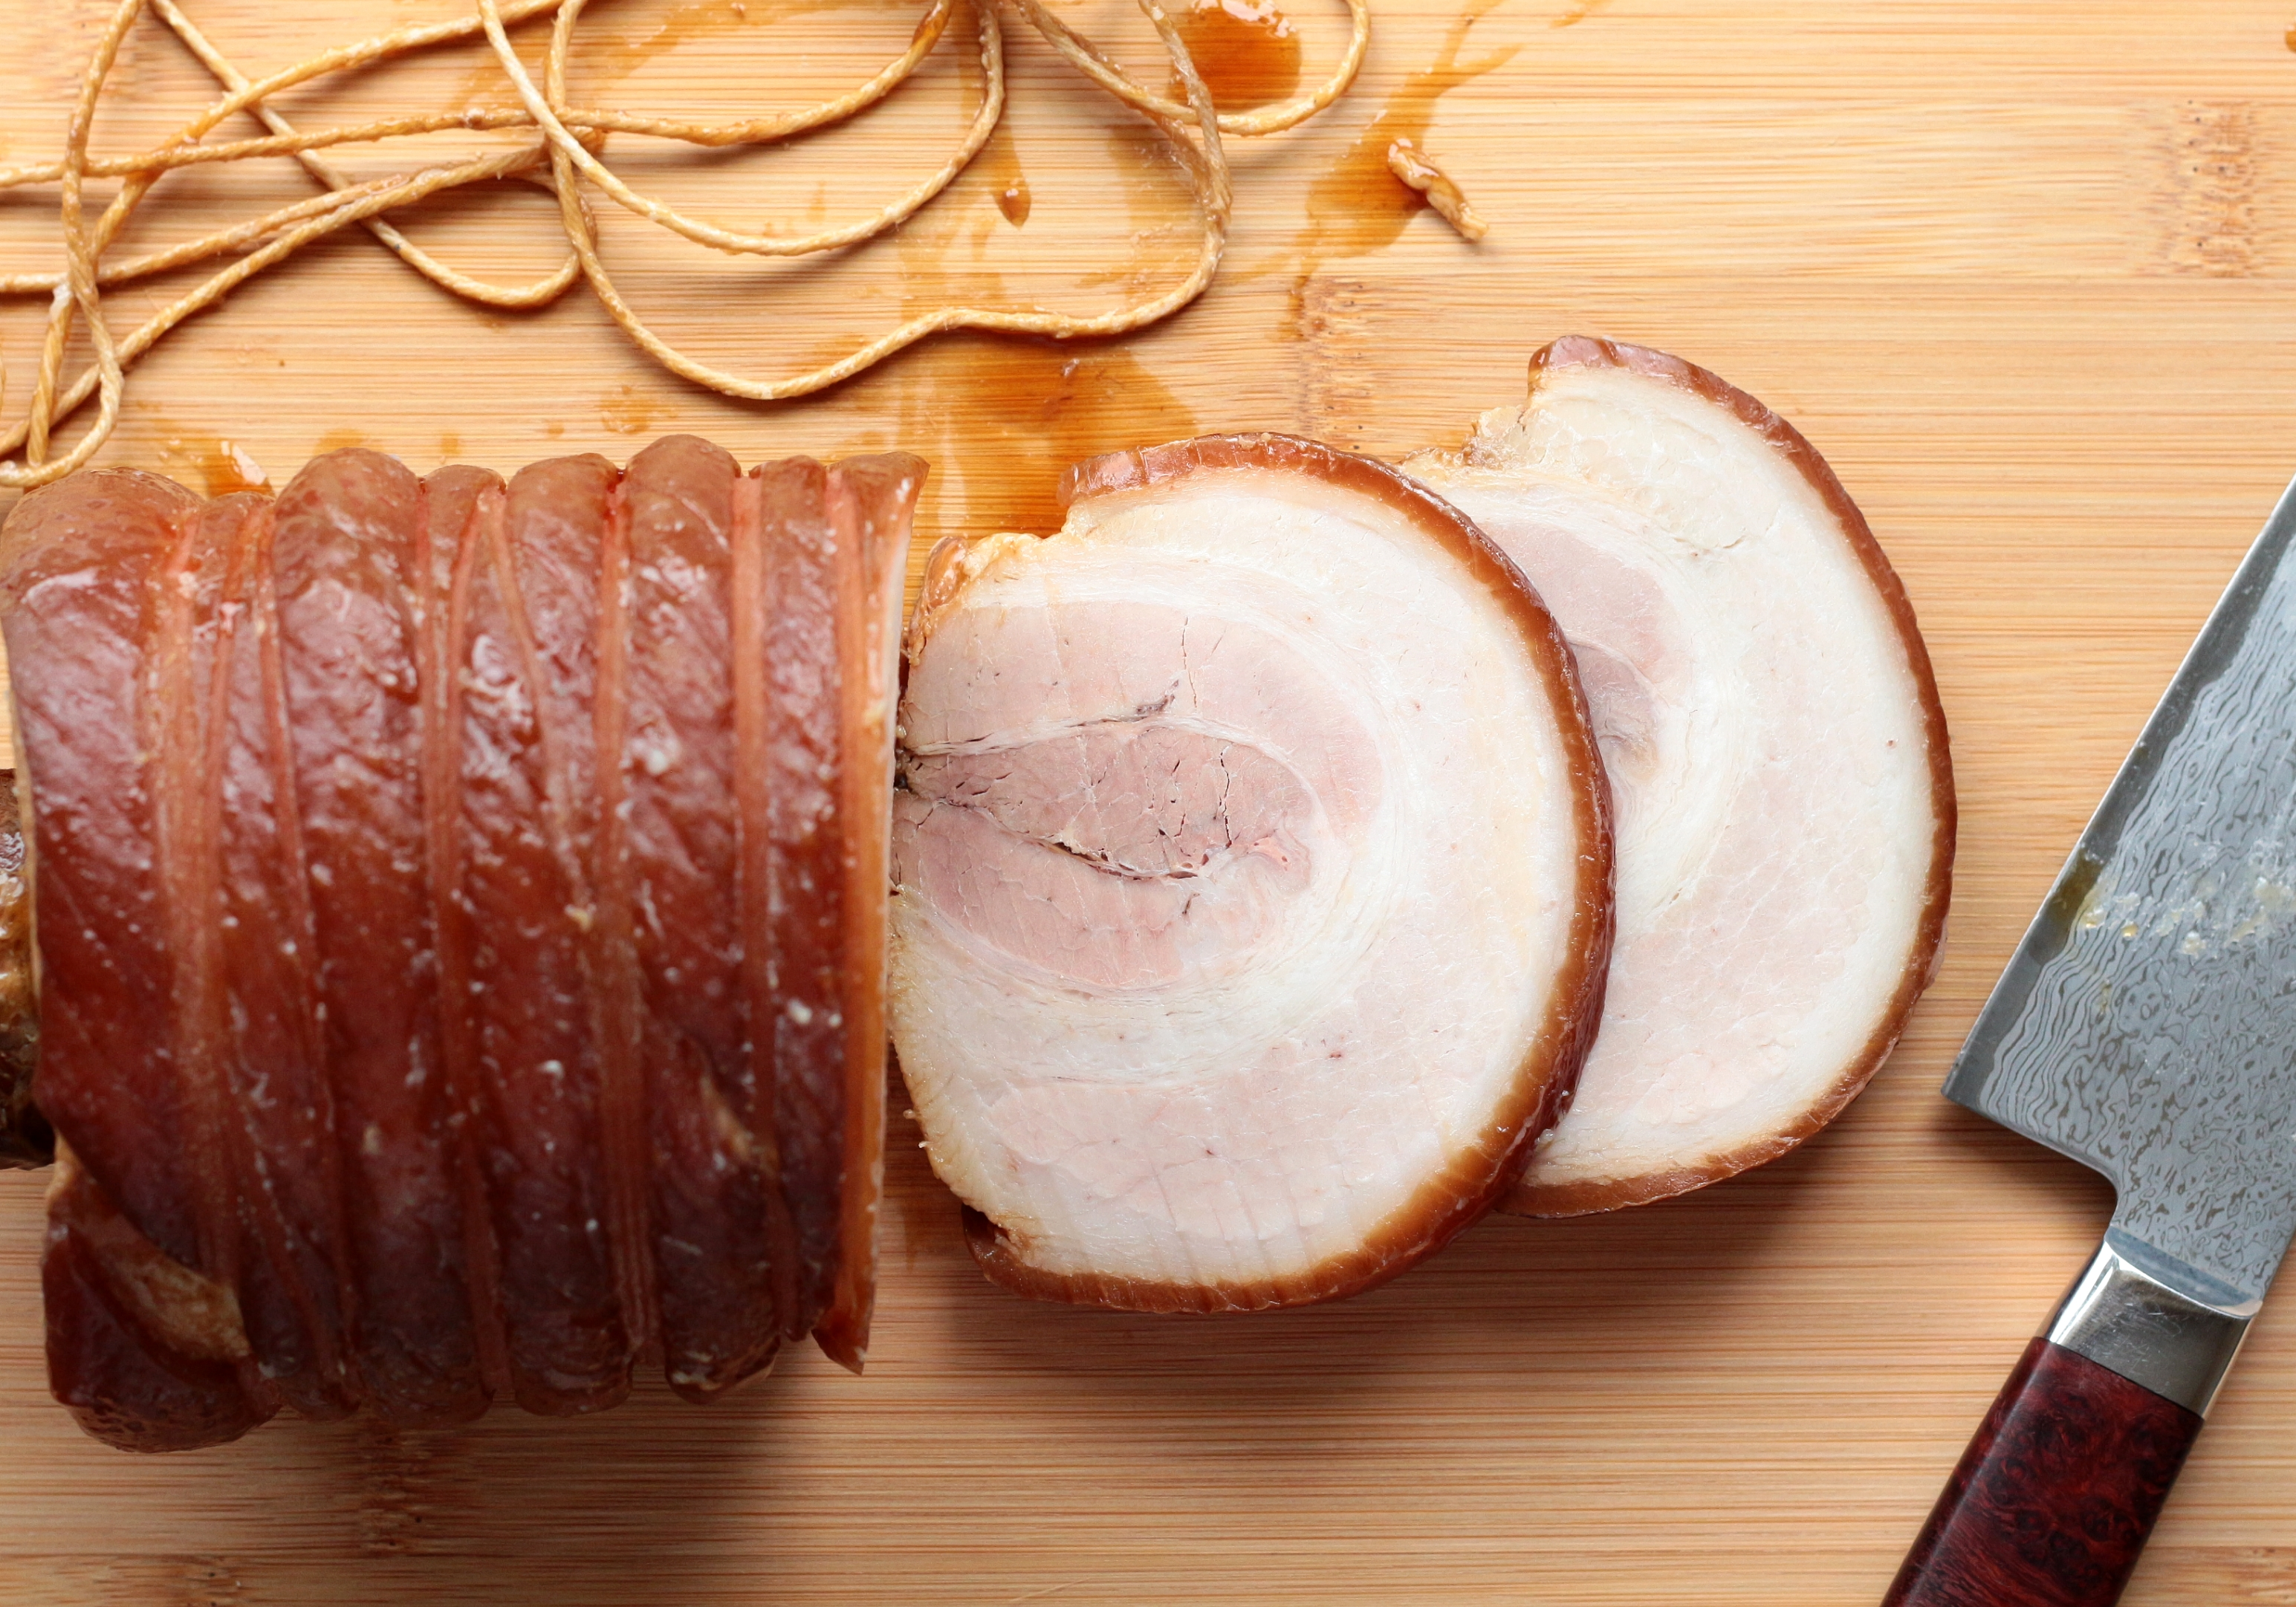 chashu pork